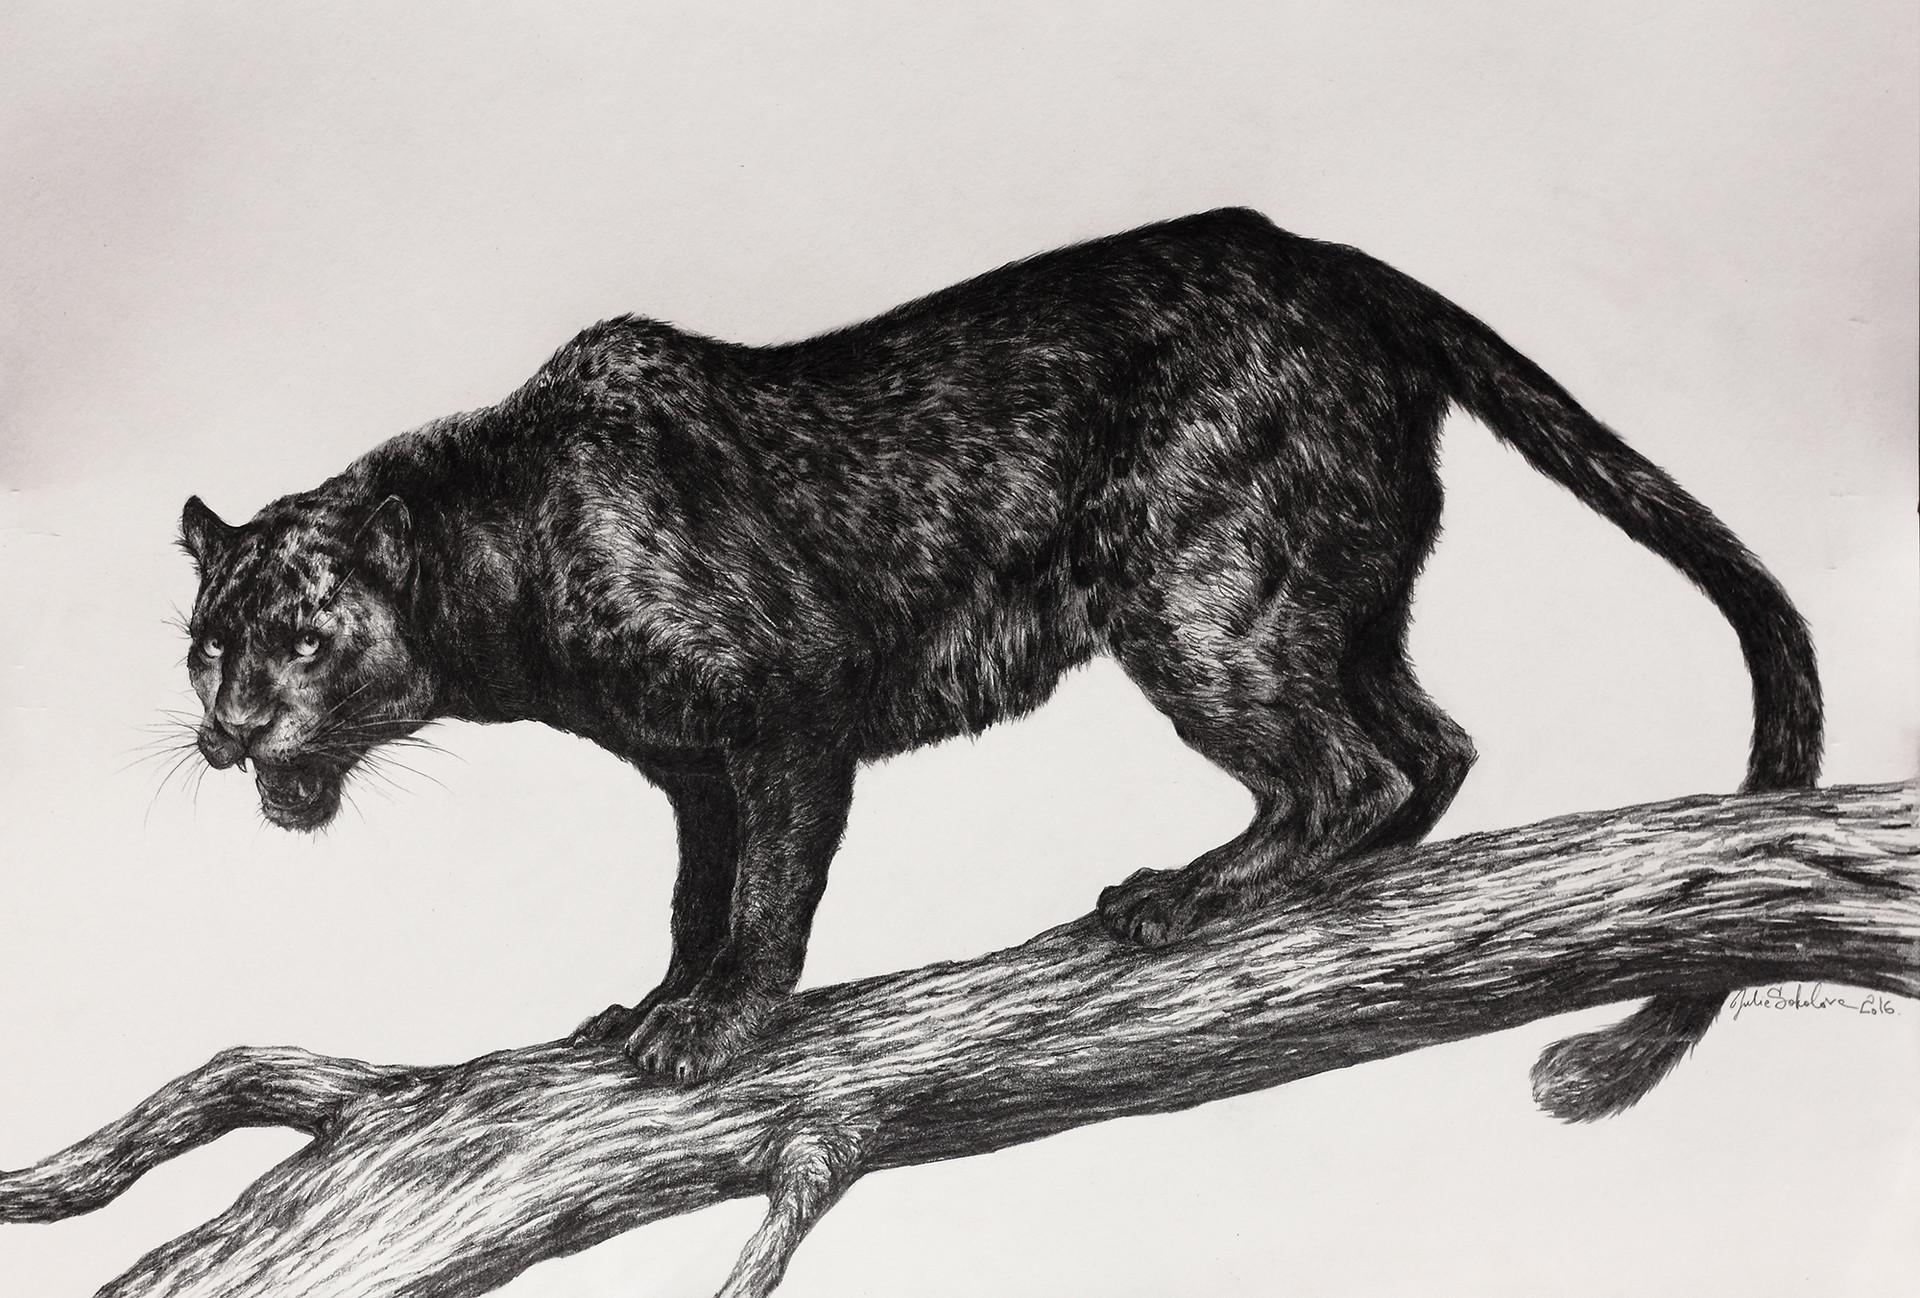 Красивые картинки карандашом пантера